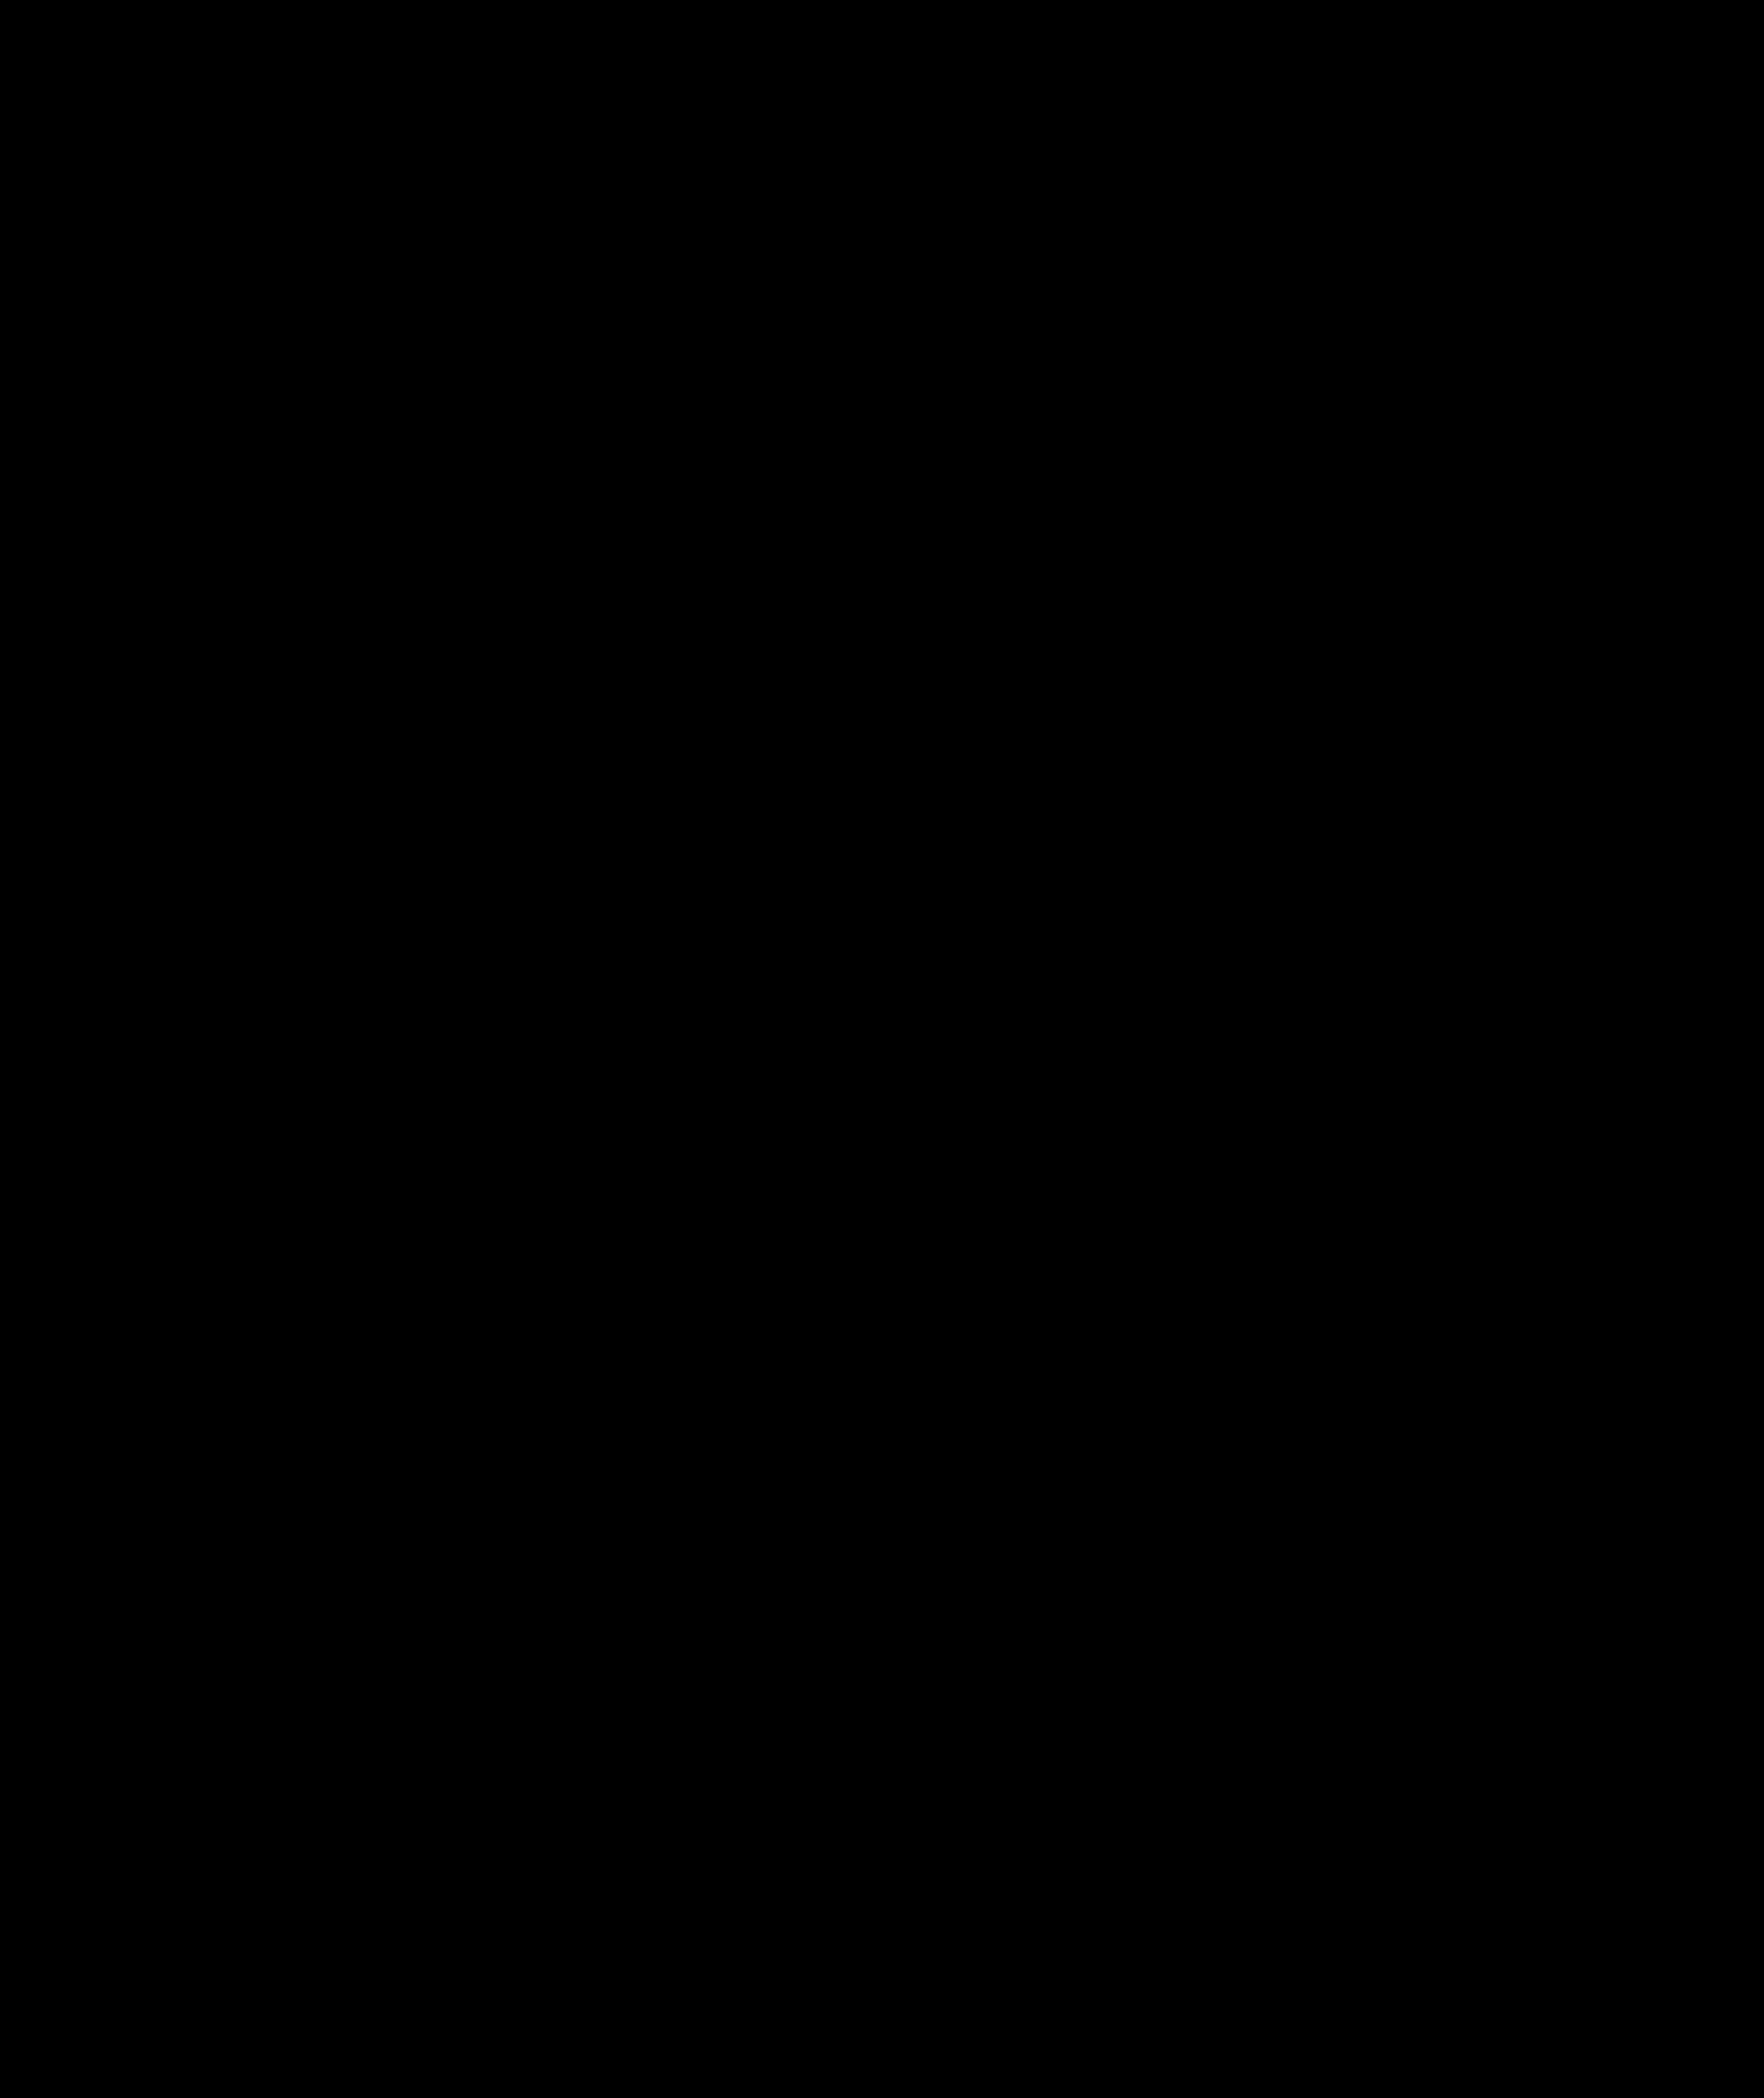 Logo Live Png File:logo Live For Life.png